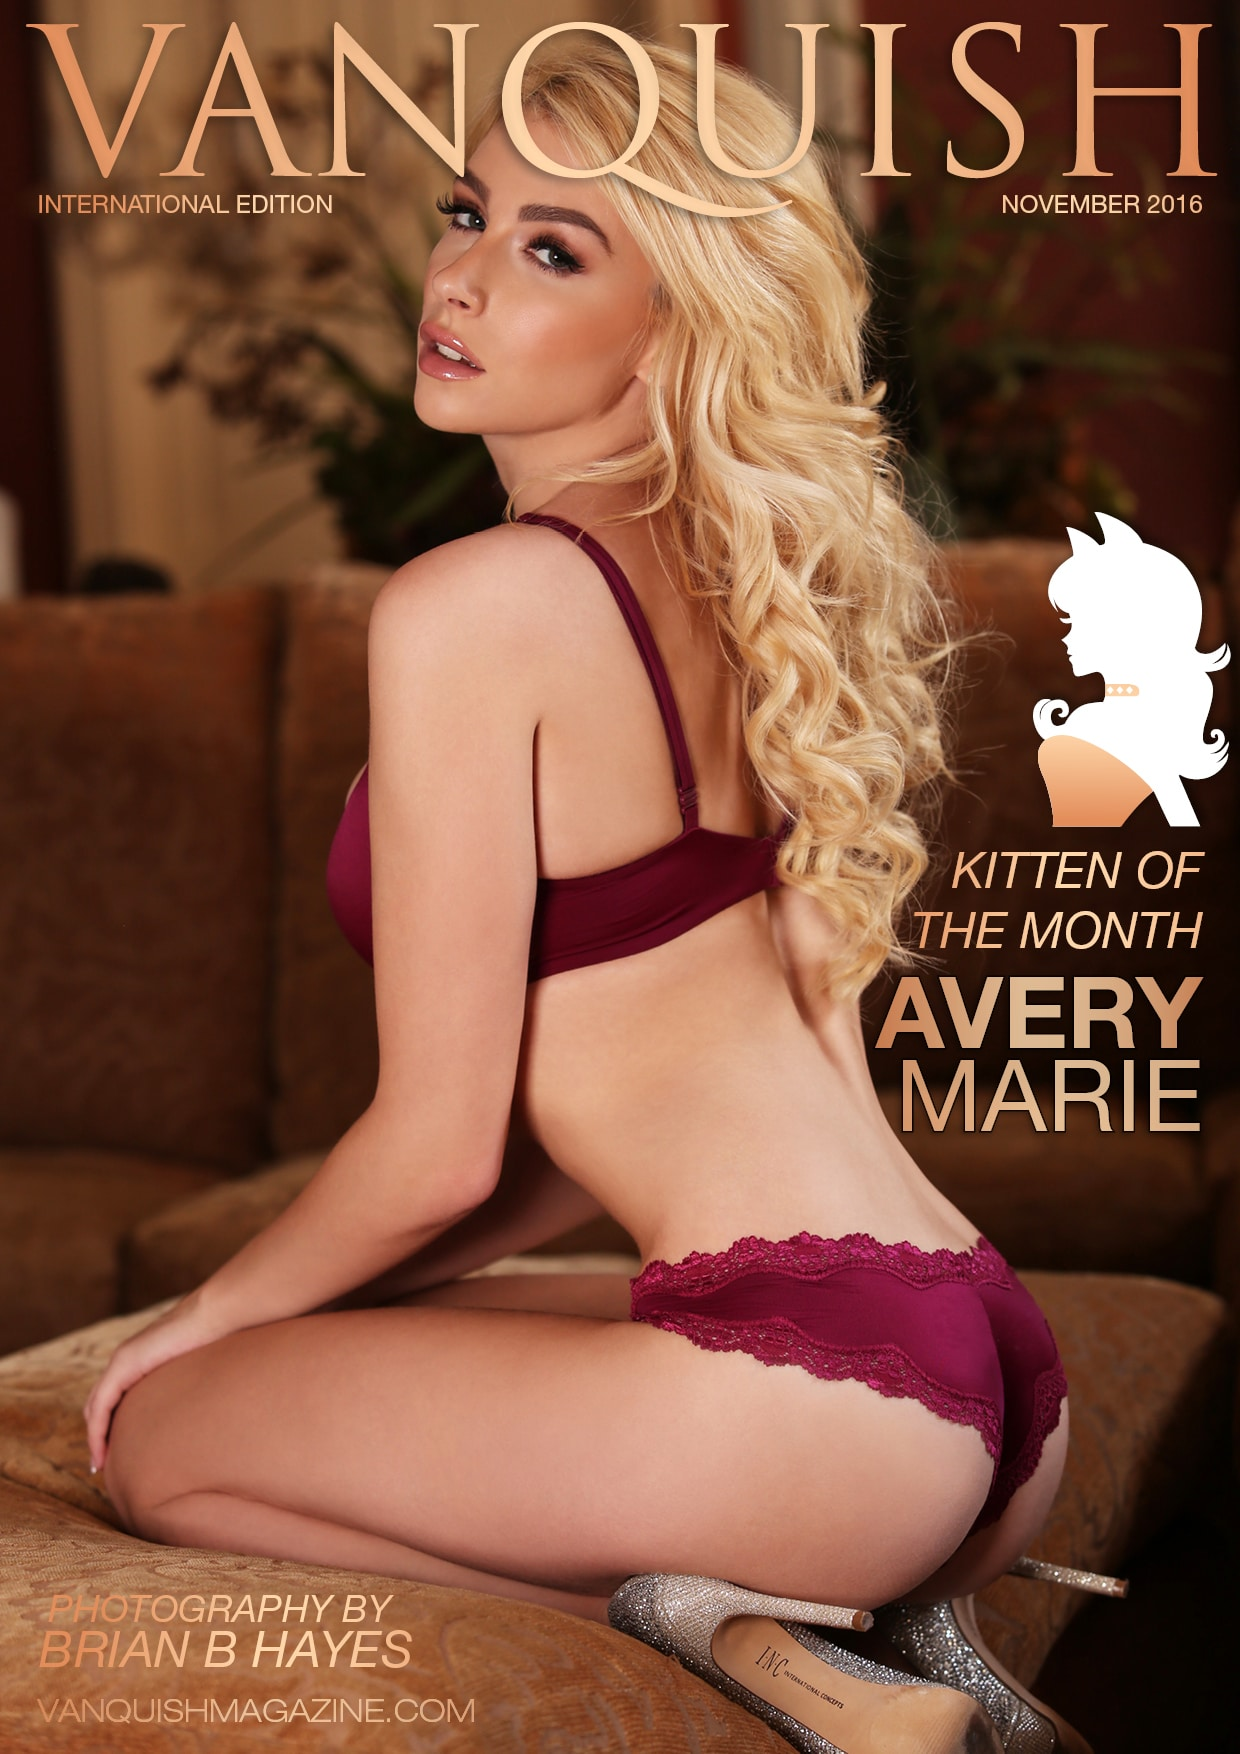 Avery Marie